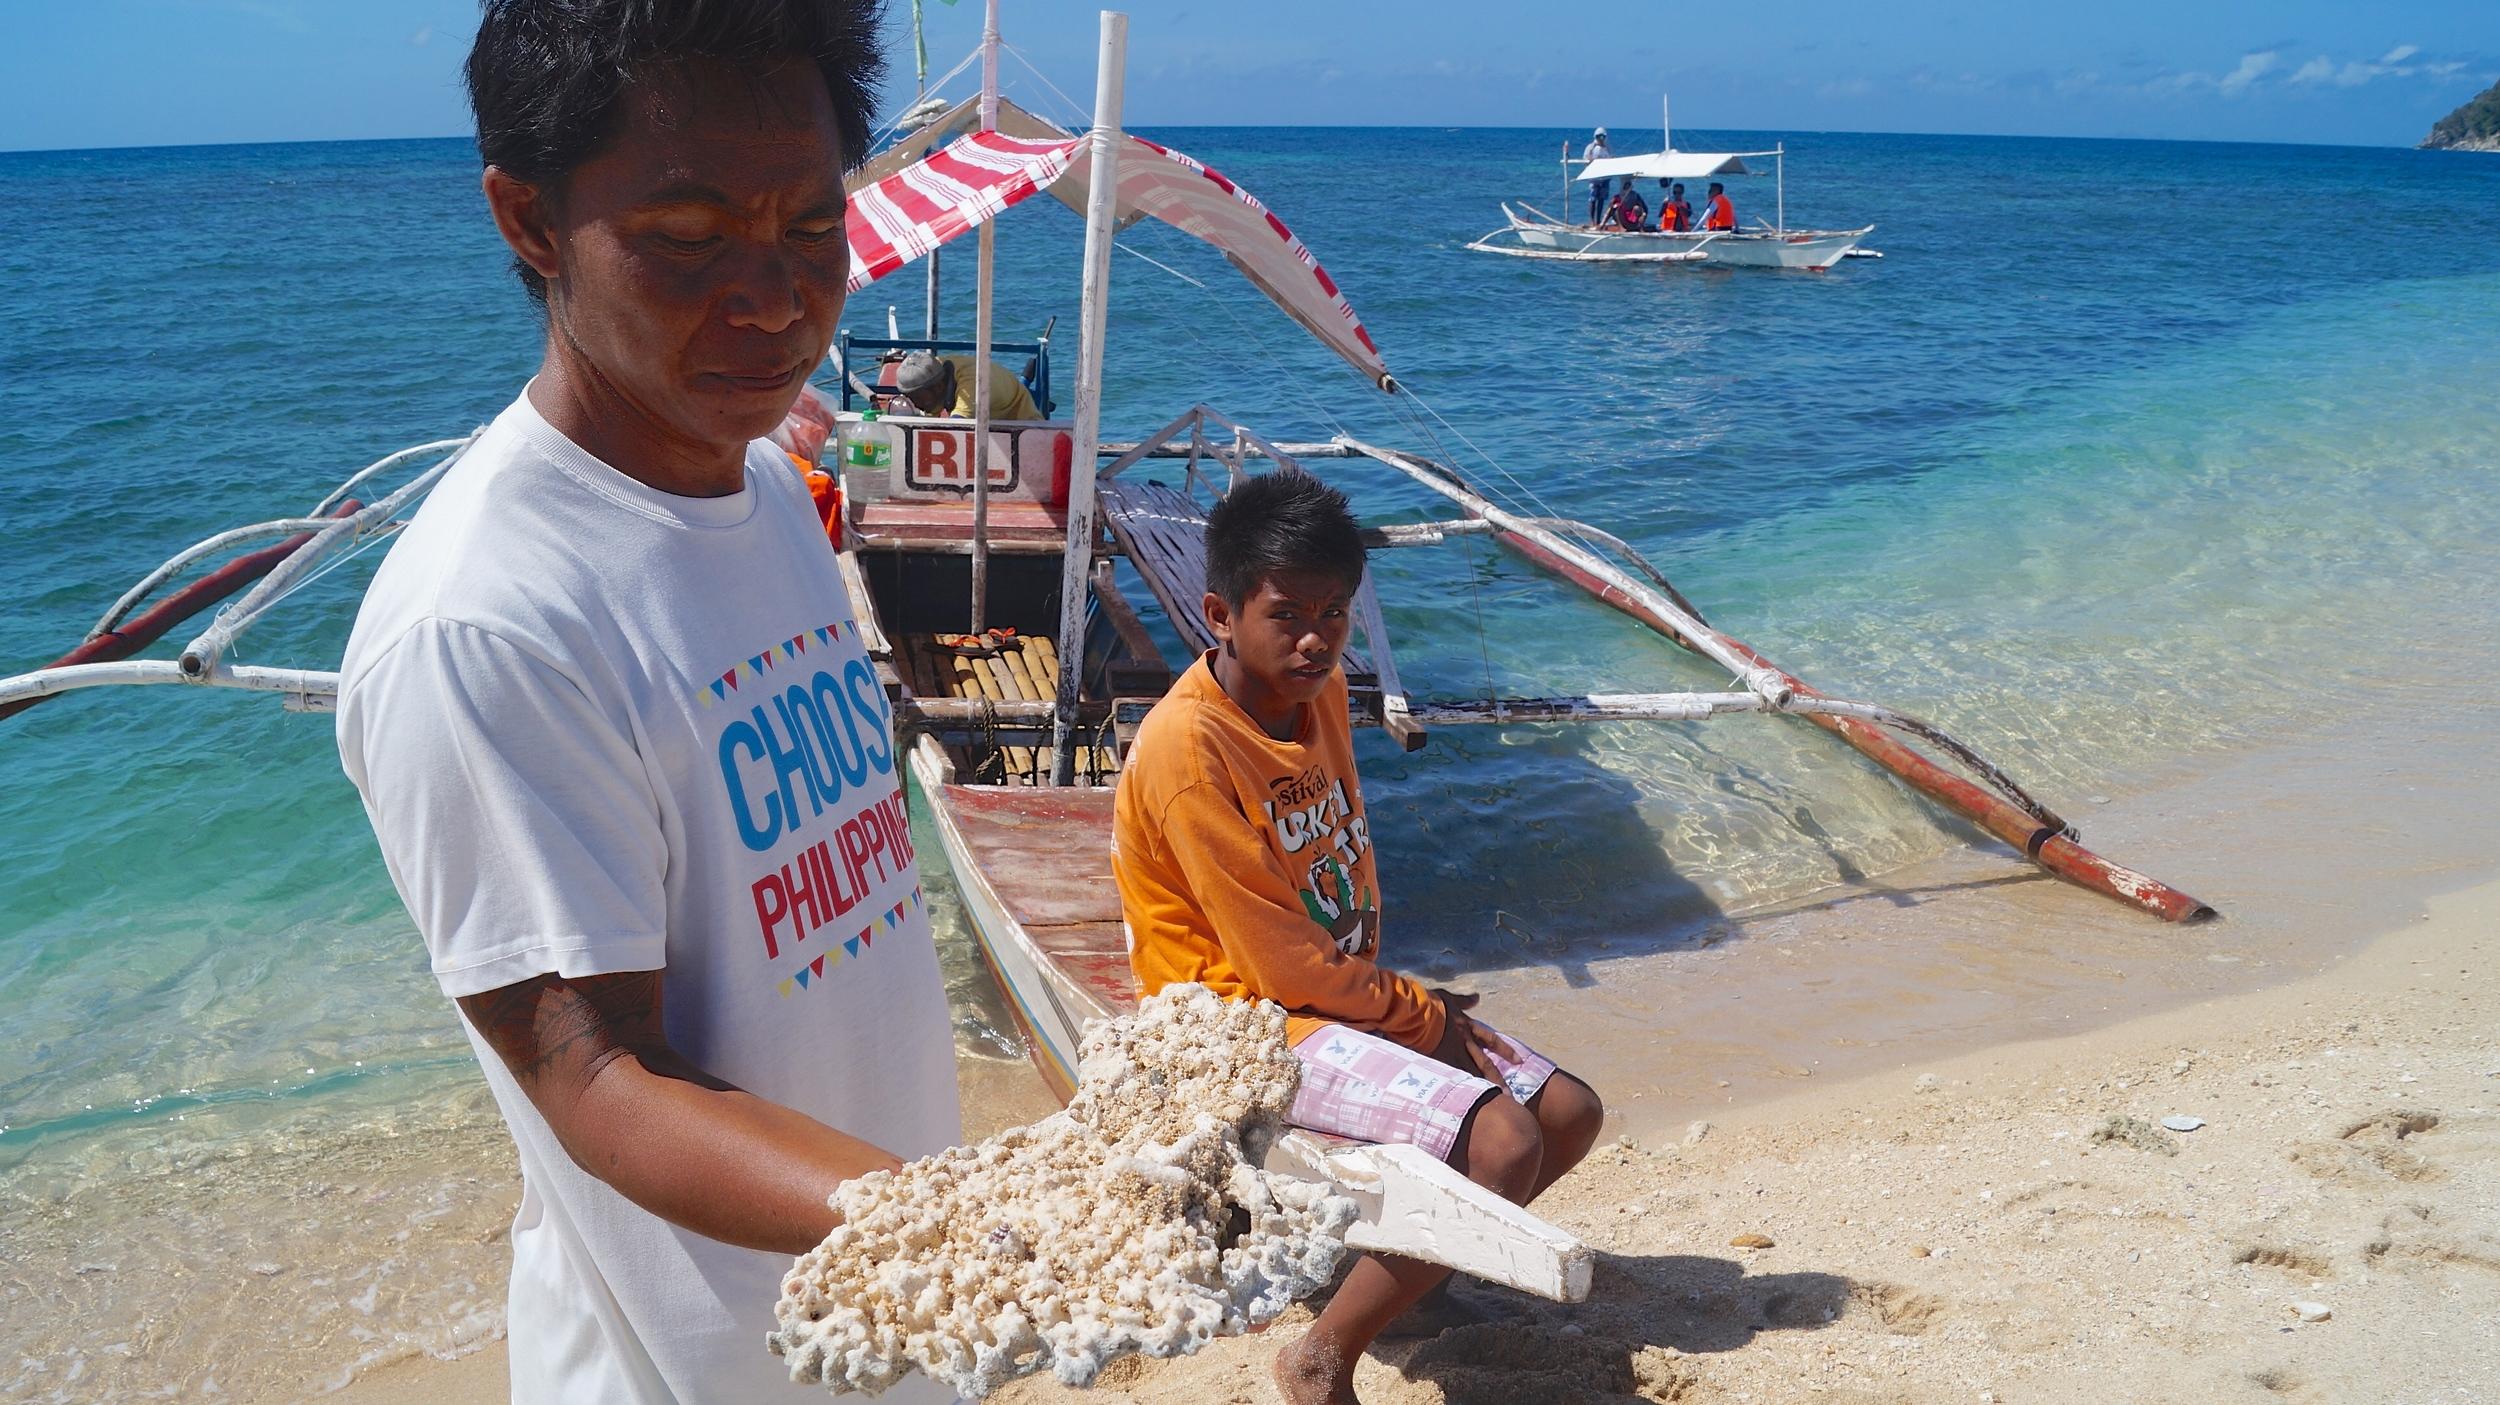 "菲律宾,Islas De Gigantes - Bantigue Sandbar Shell Locals -照明beplay3体育官方下载"">              </noscript>              <img class="